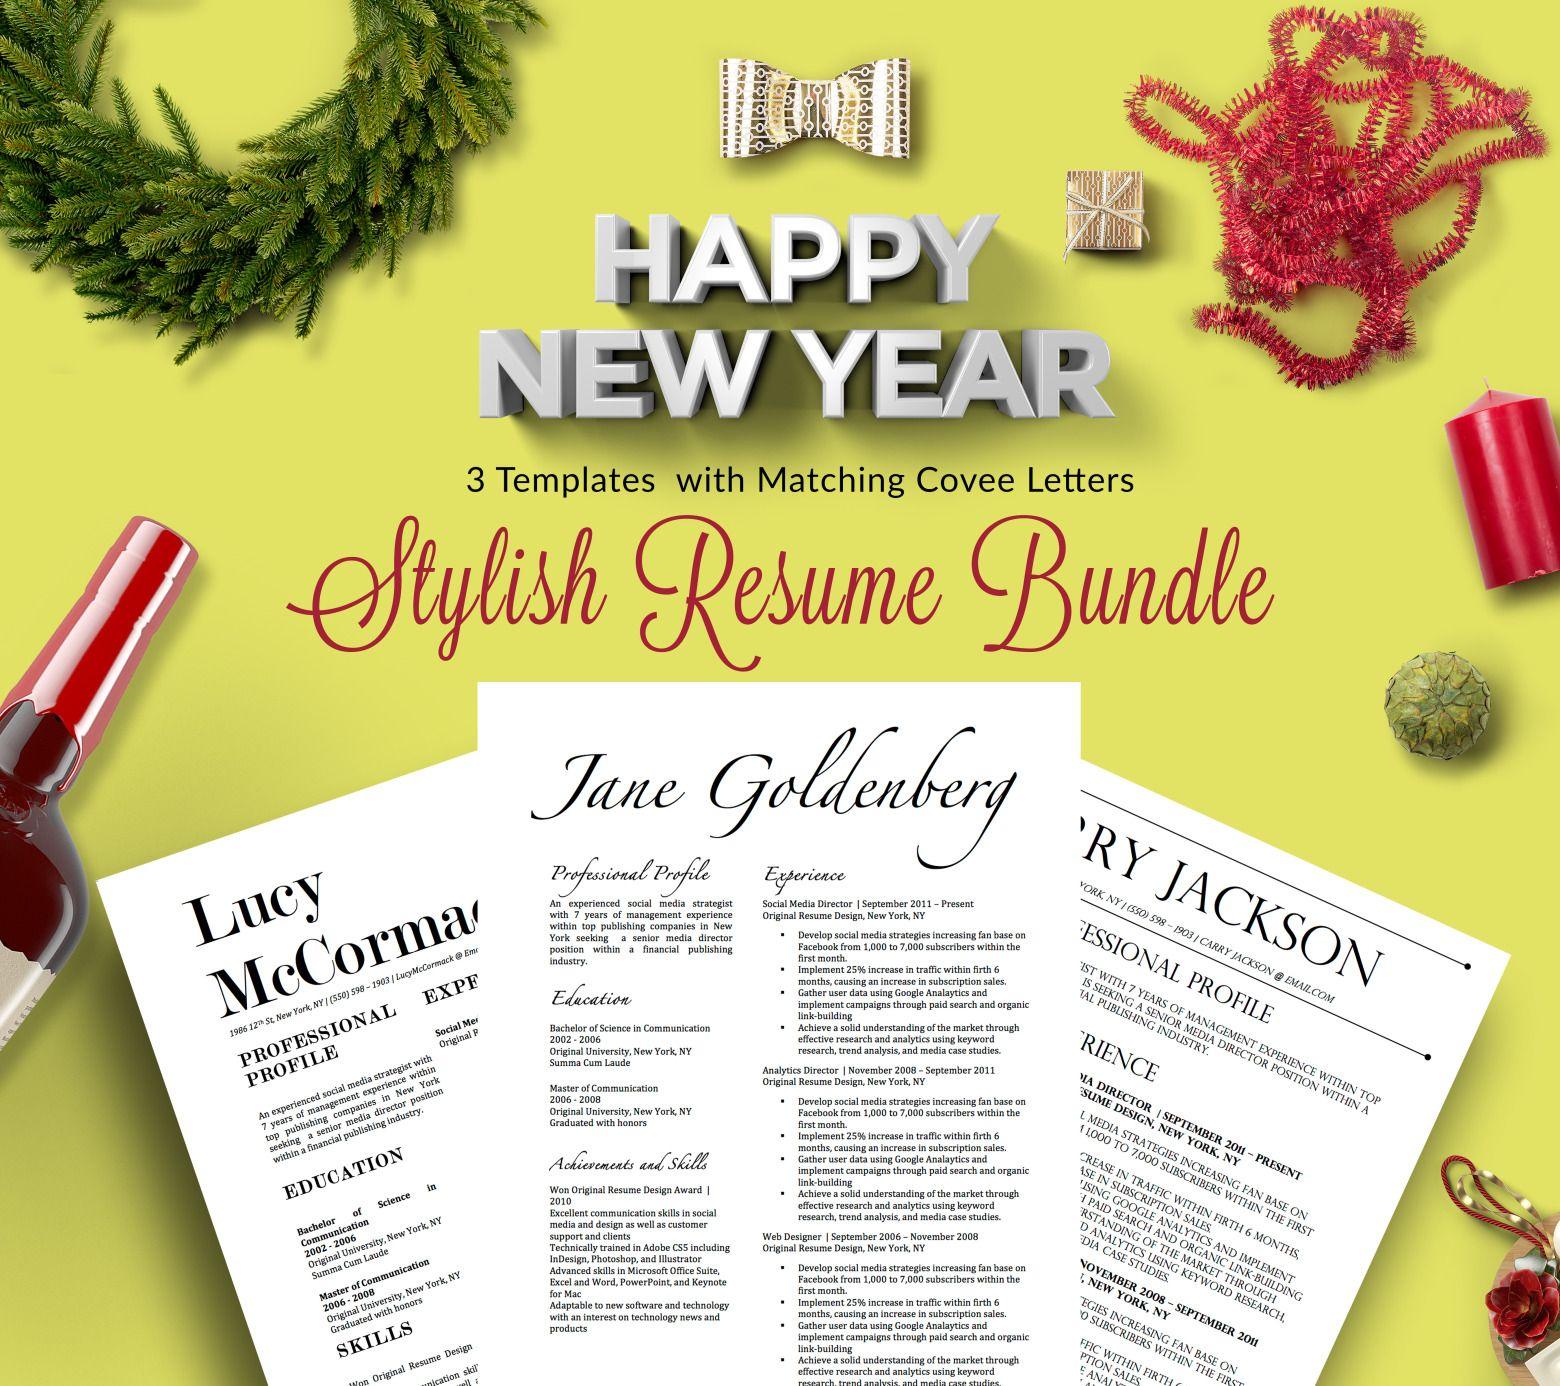 Stylish Resume Bundle 3 Beautiful Resume Designs With Match